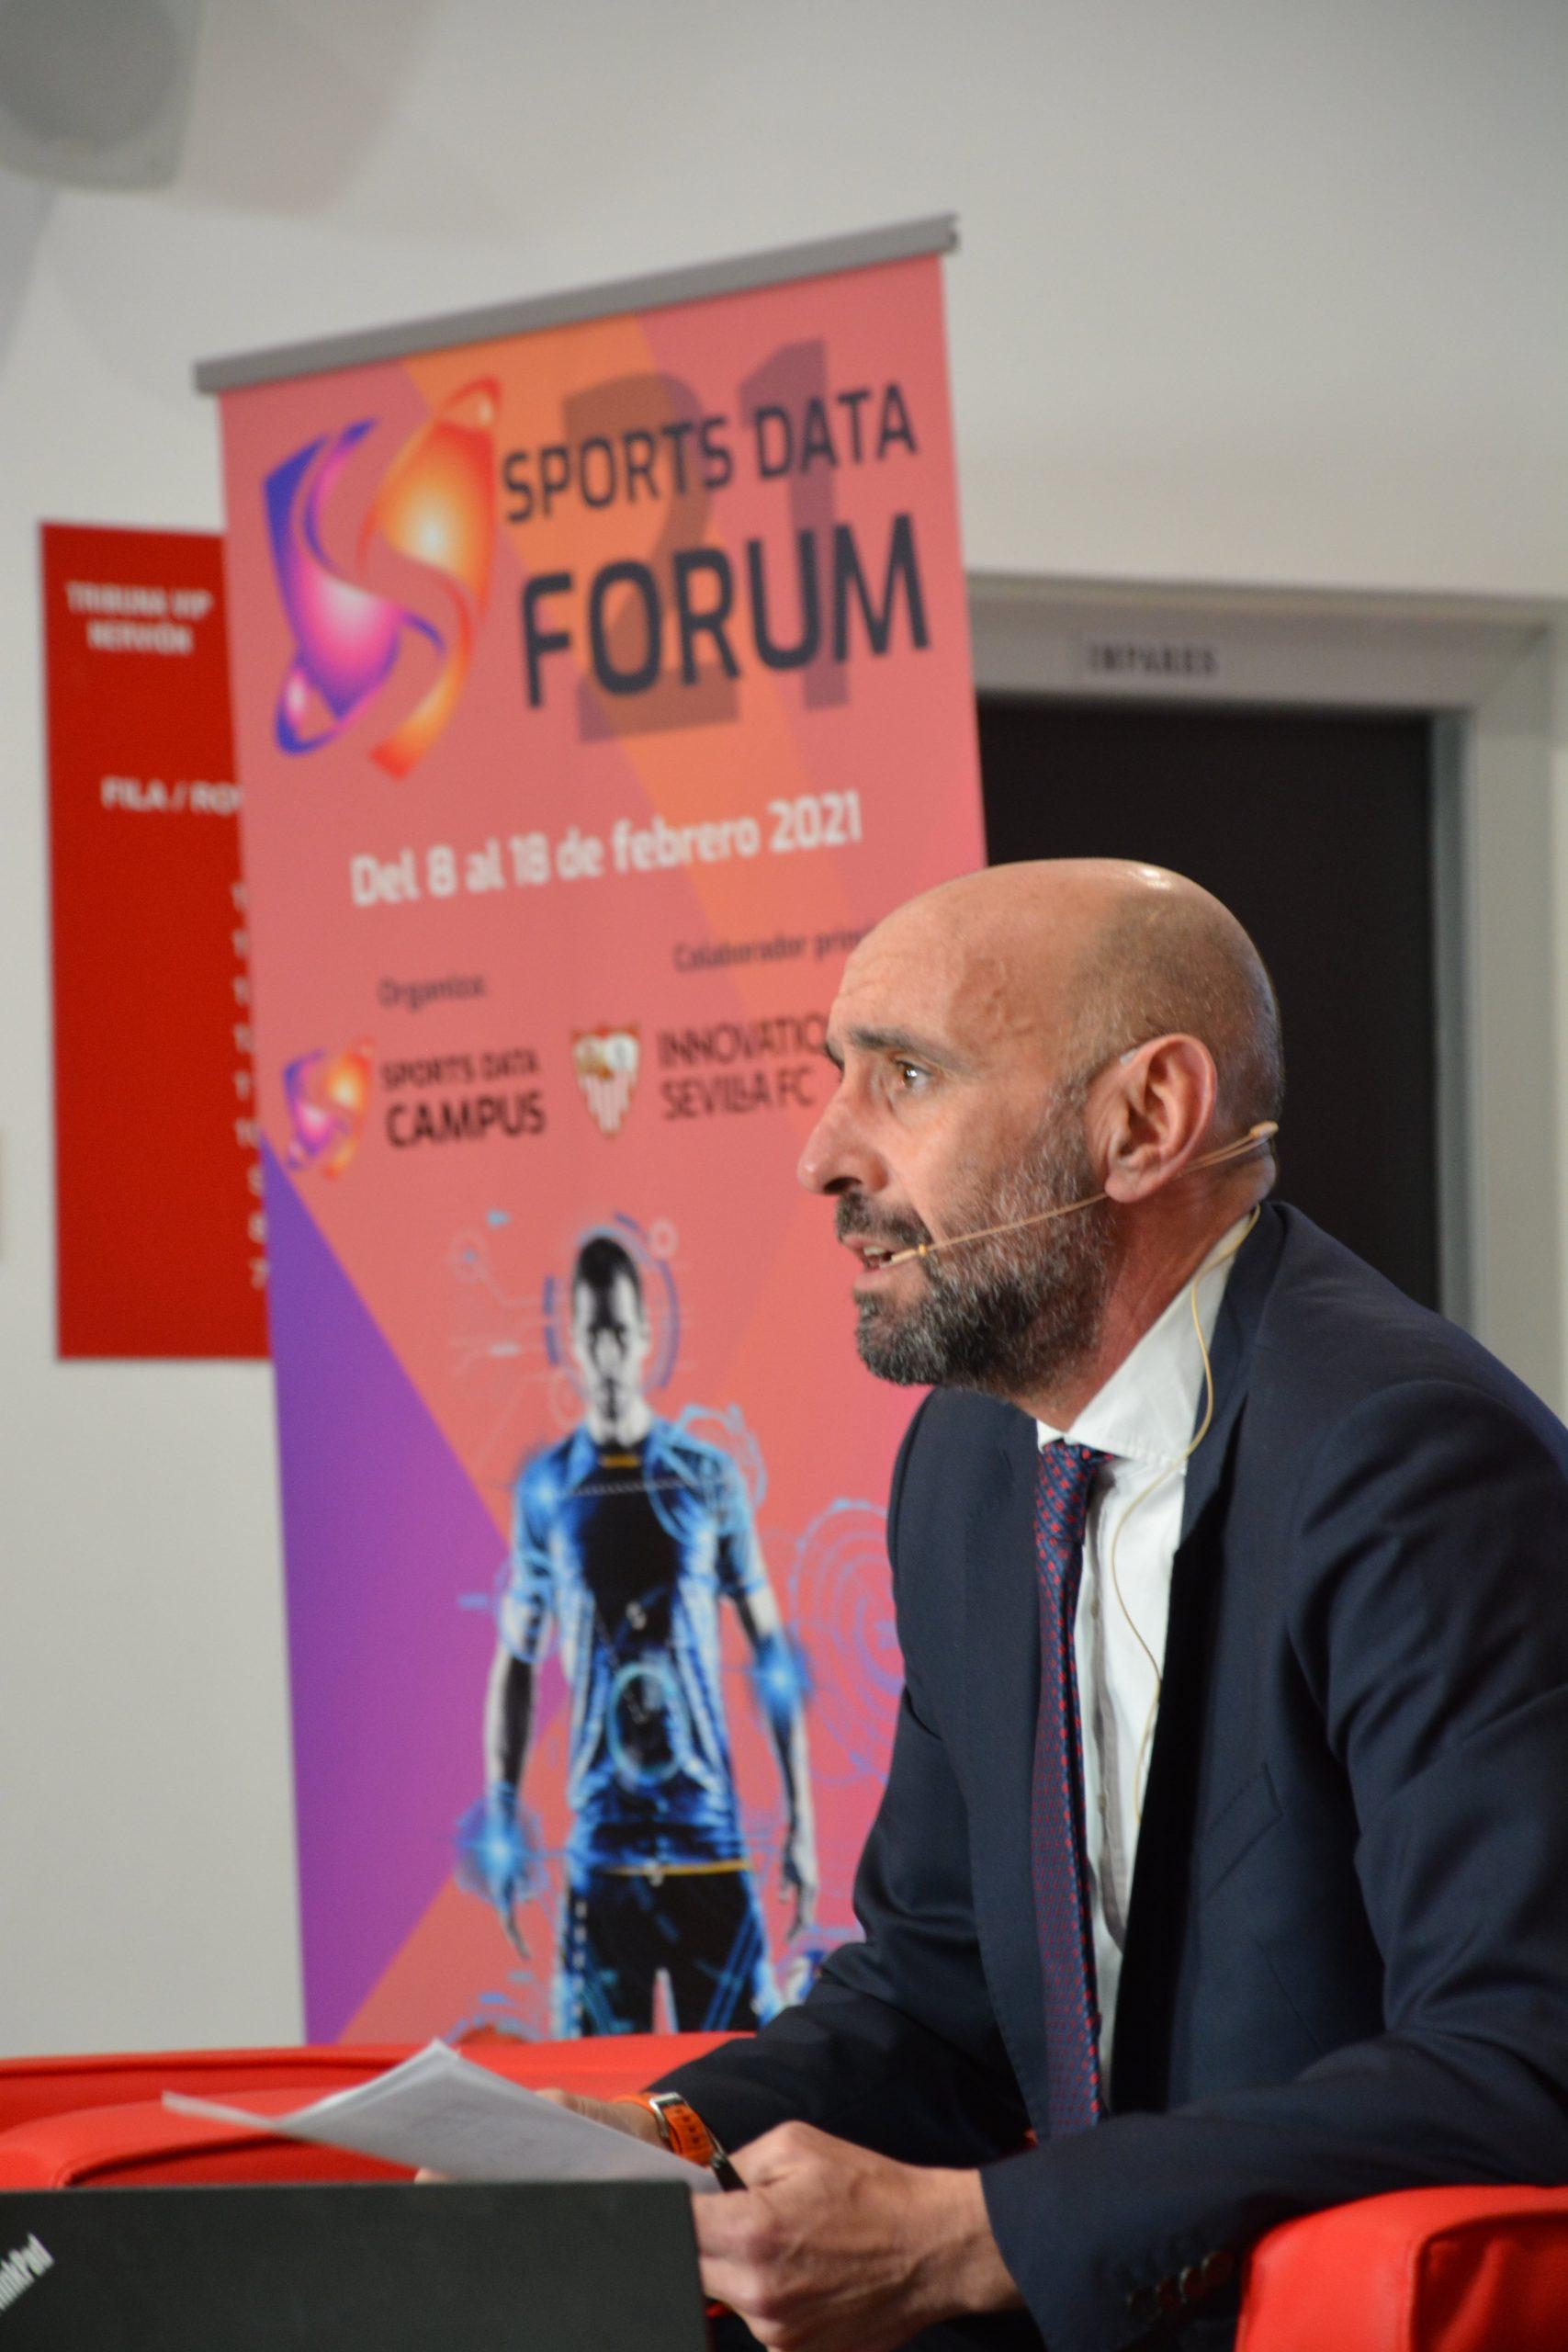 Manu Heredia Football Data International Forum